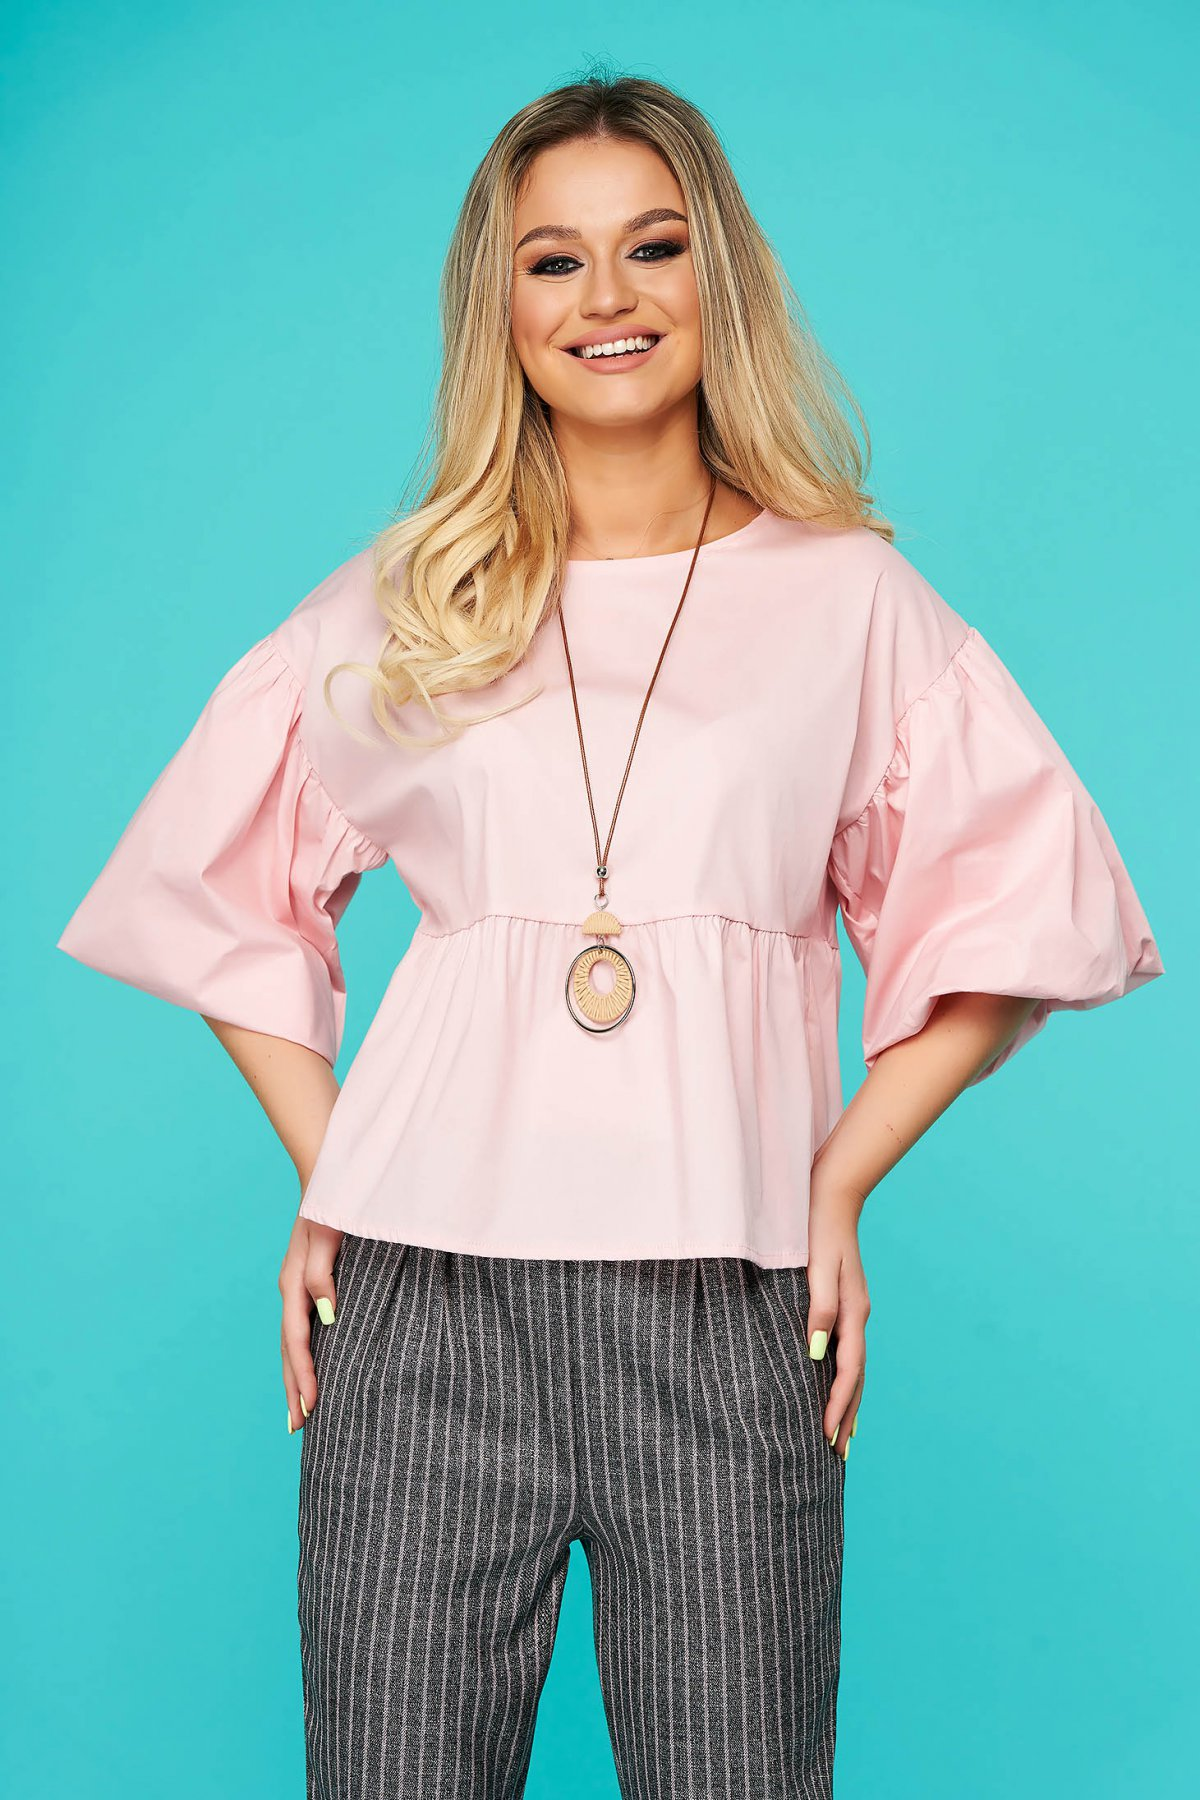 SunShine Bluza dama SunShine roz deschis eleganta scurta cu croi larg din bumbac subtire cu accesoriu tip colier